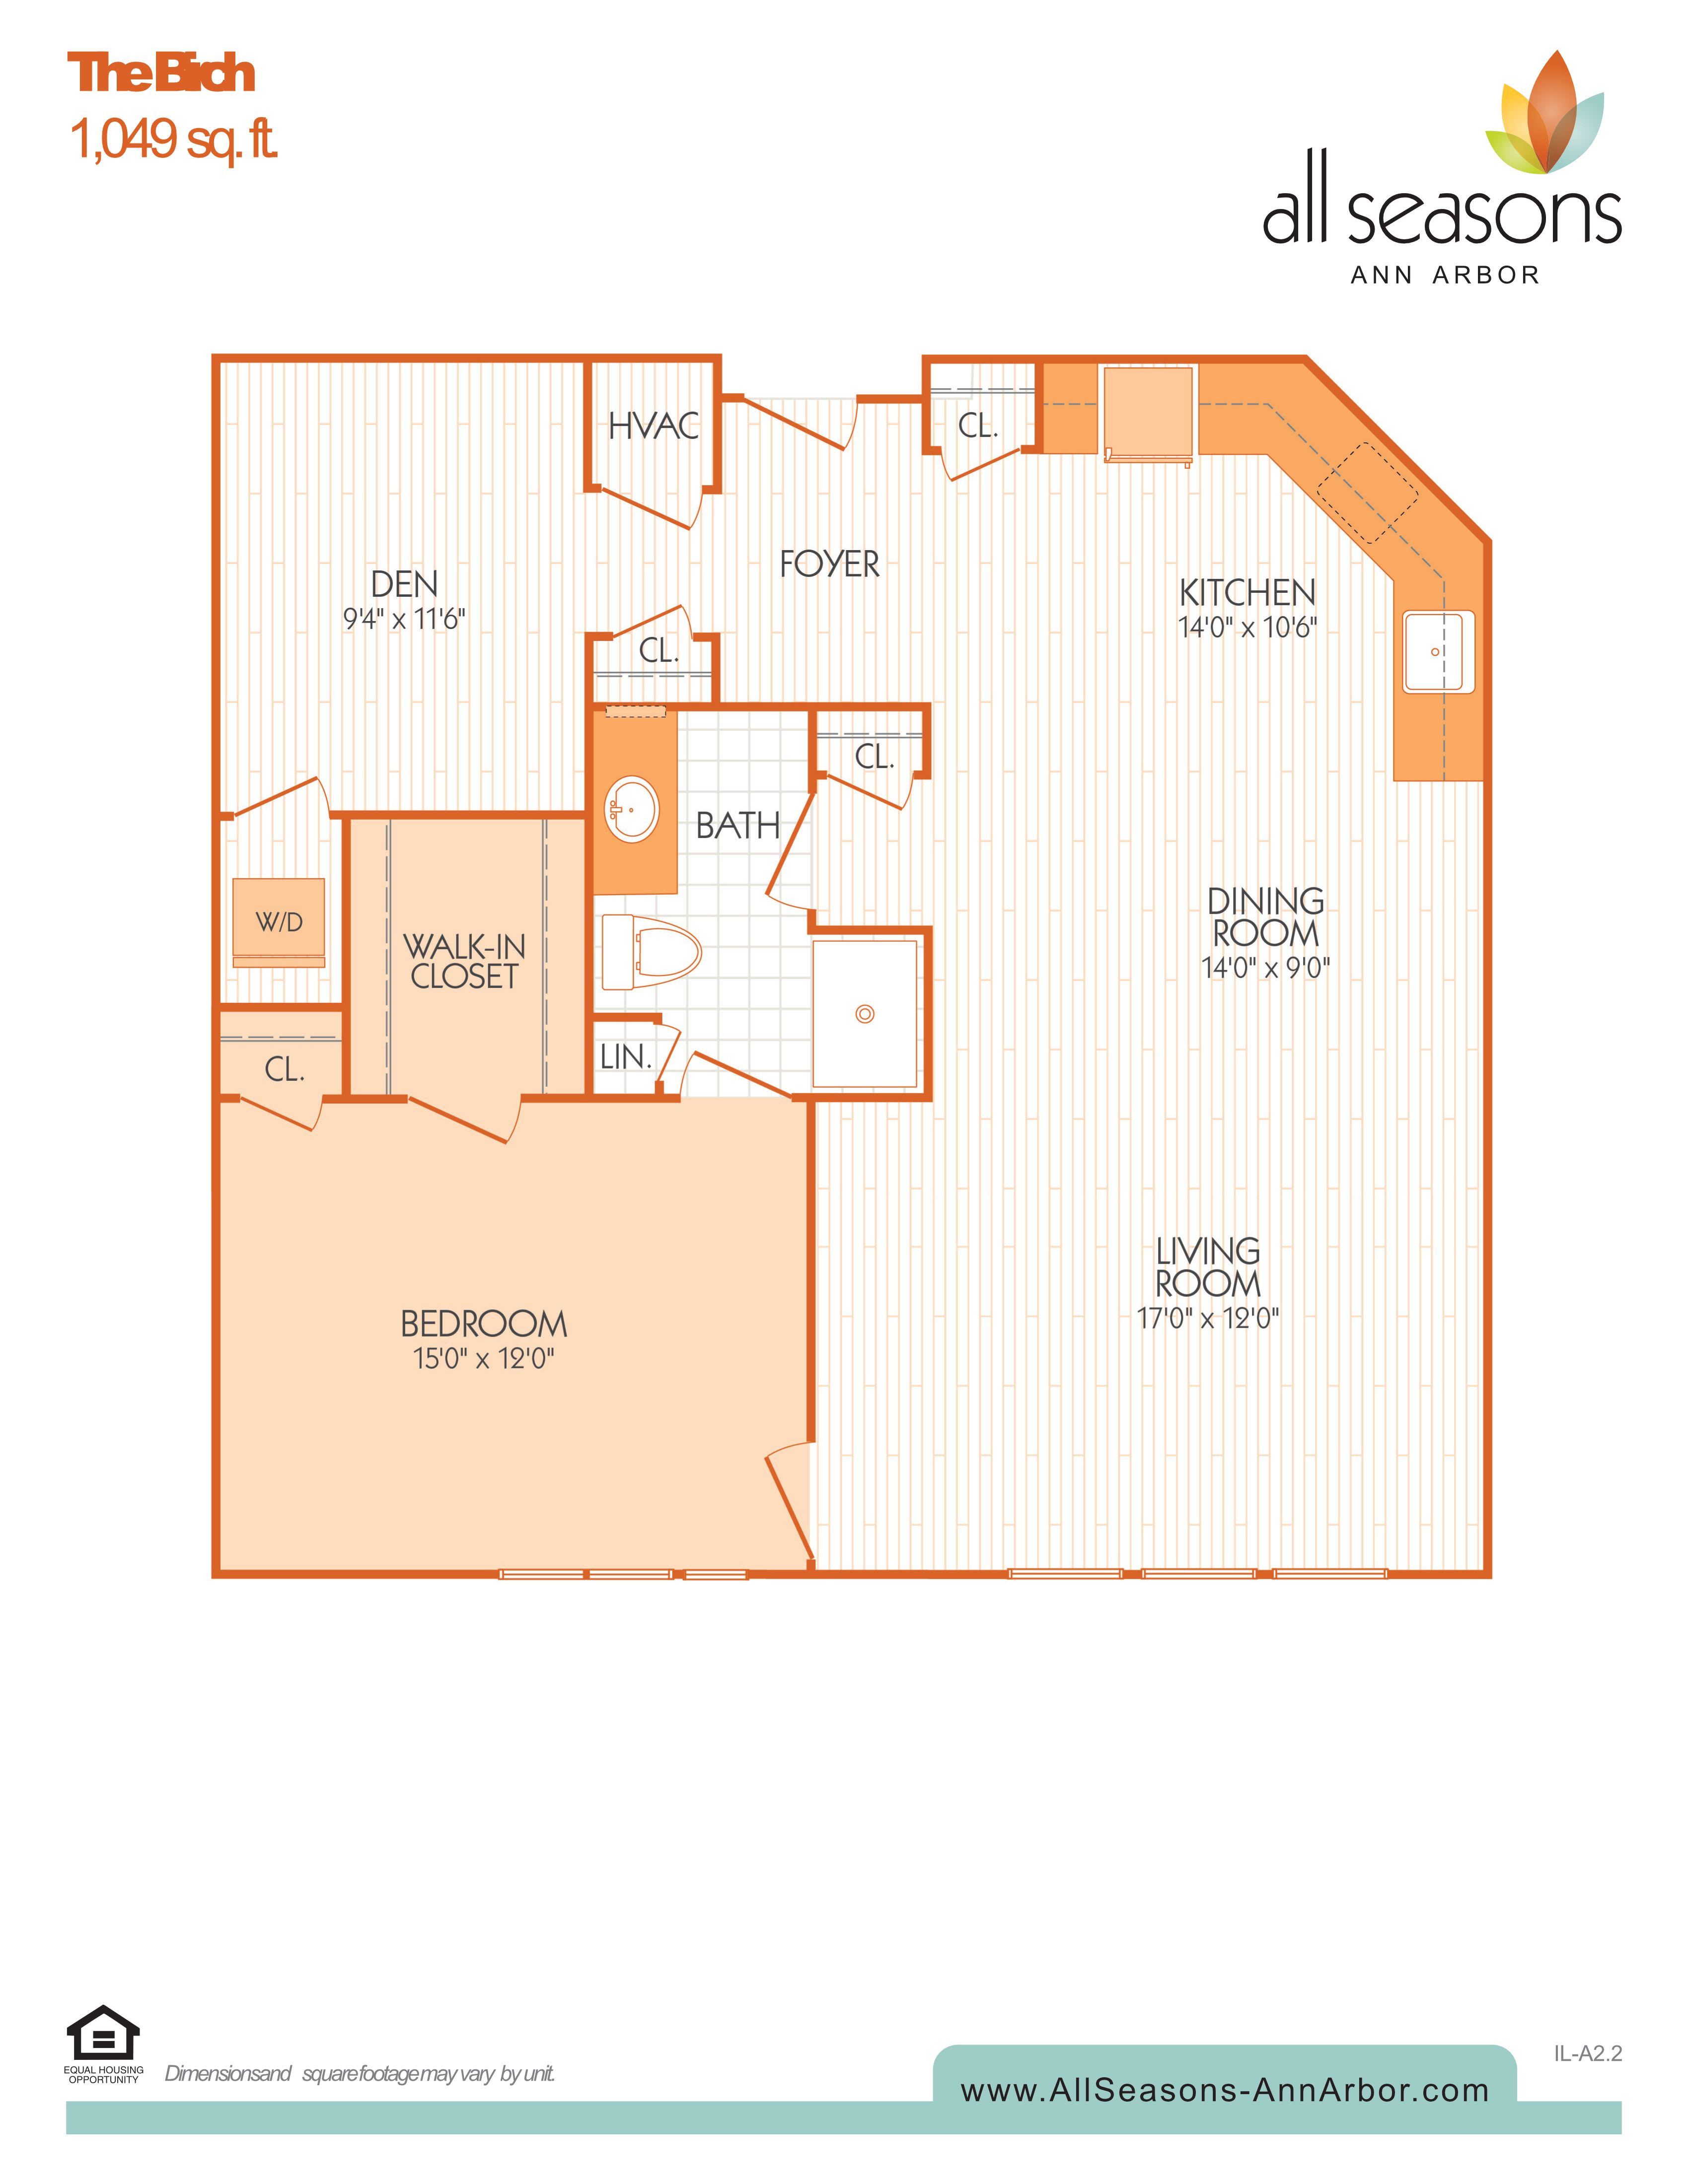 The Birch floor plan at All Seasons Ann Arbor in Ann Arbor, Michigan